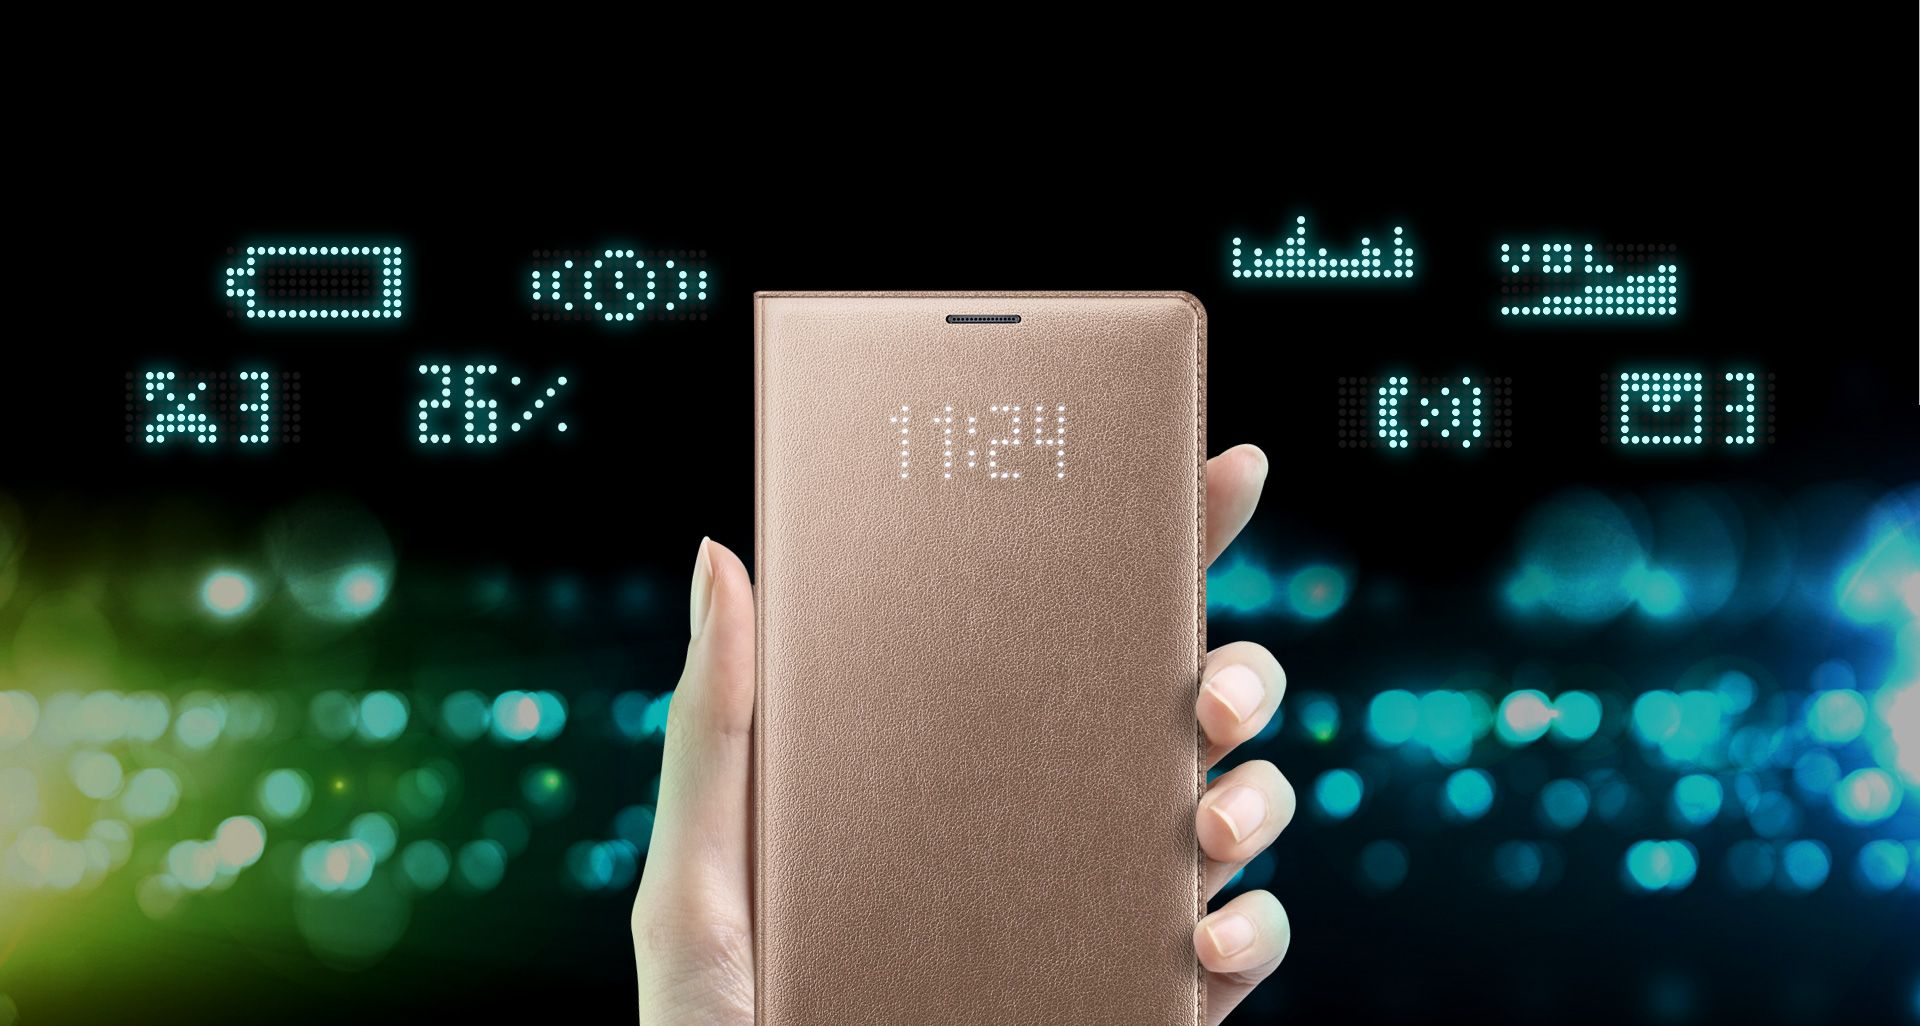 buy popular 6fc97 8f48e Galaxy Note 4 LED Flip Cover | Samsung Galaxy Note 4 | Samsung ...